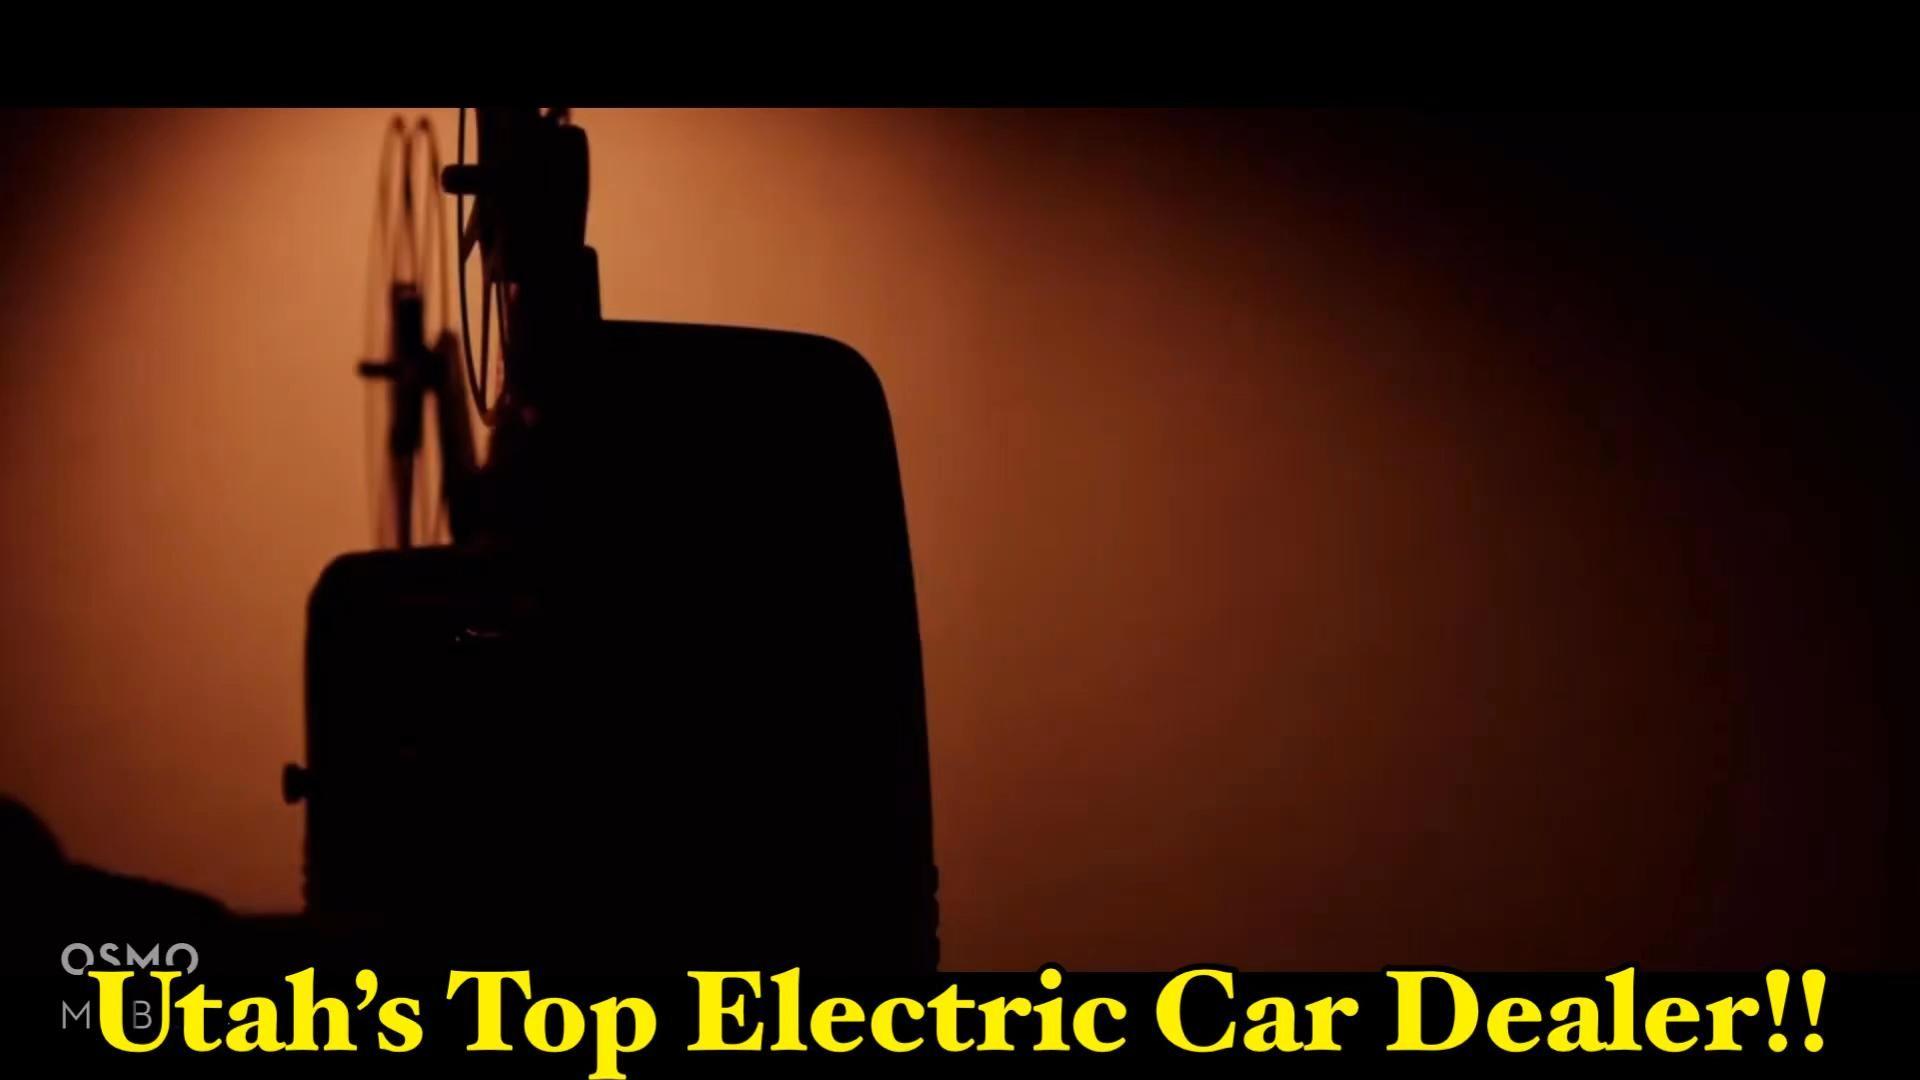 David@gofamilyauto.com. #electriccars #chevroletBolt #Fiat500e #nissanleaf #carsforsale #zeroemissions